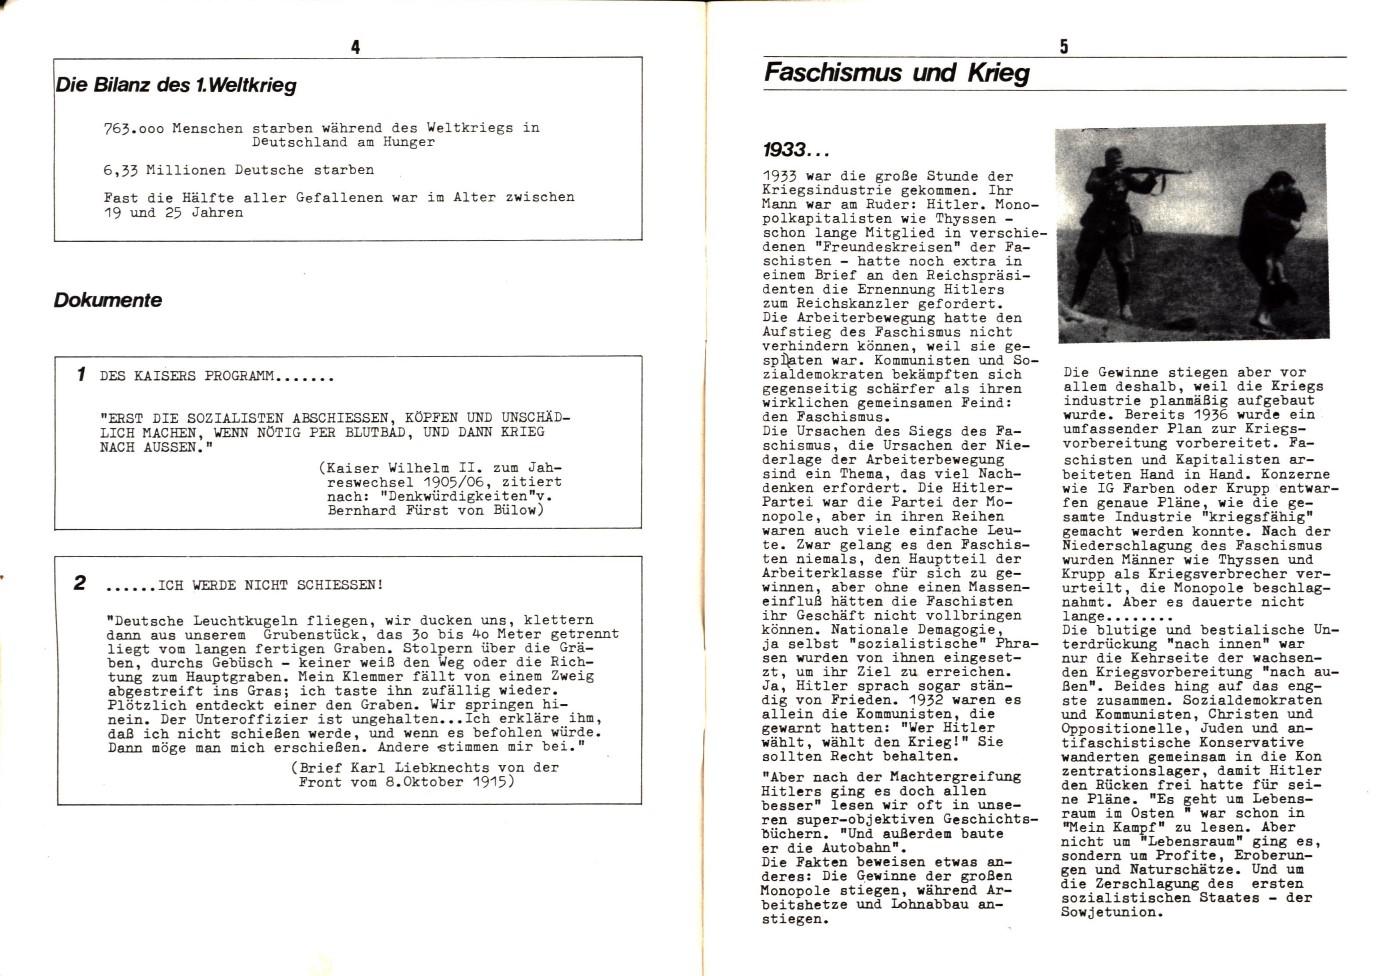 KJVD_1979_Dokumente_zum_Antikriegstag_04